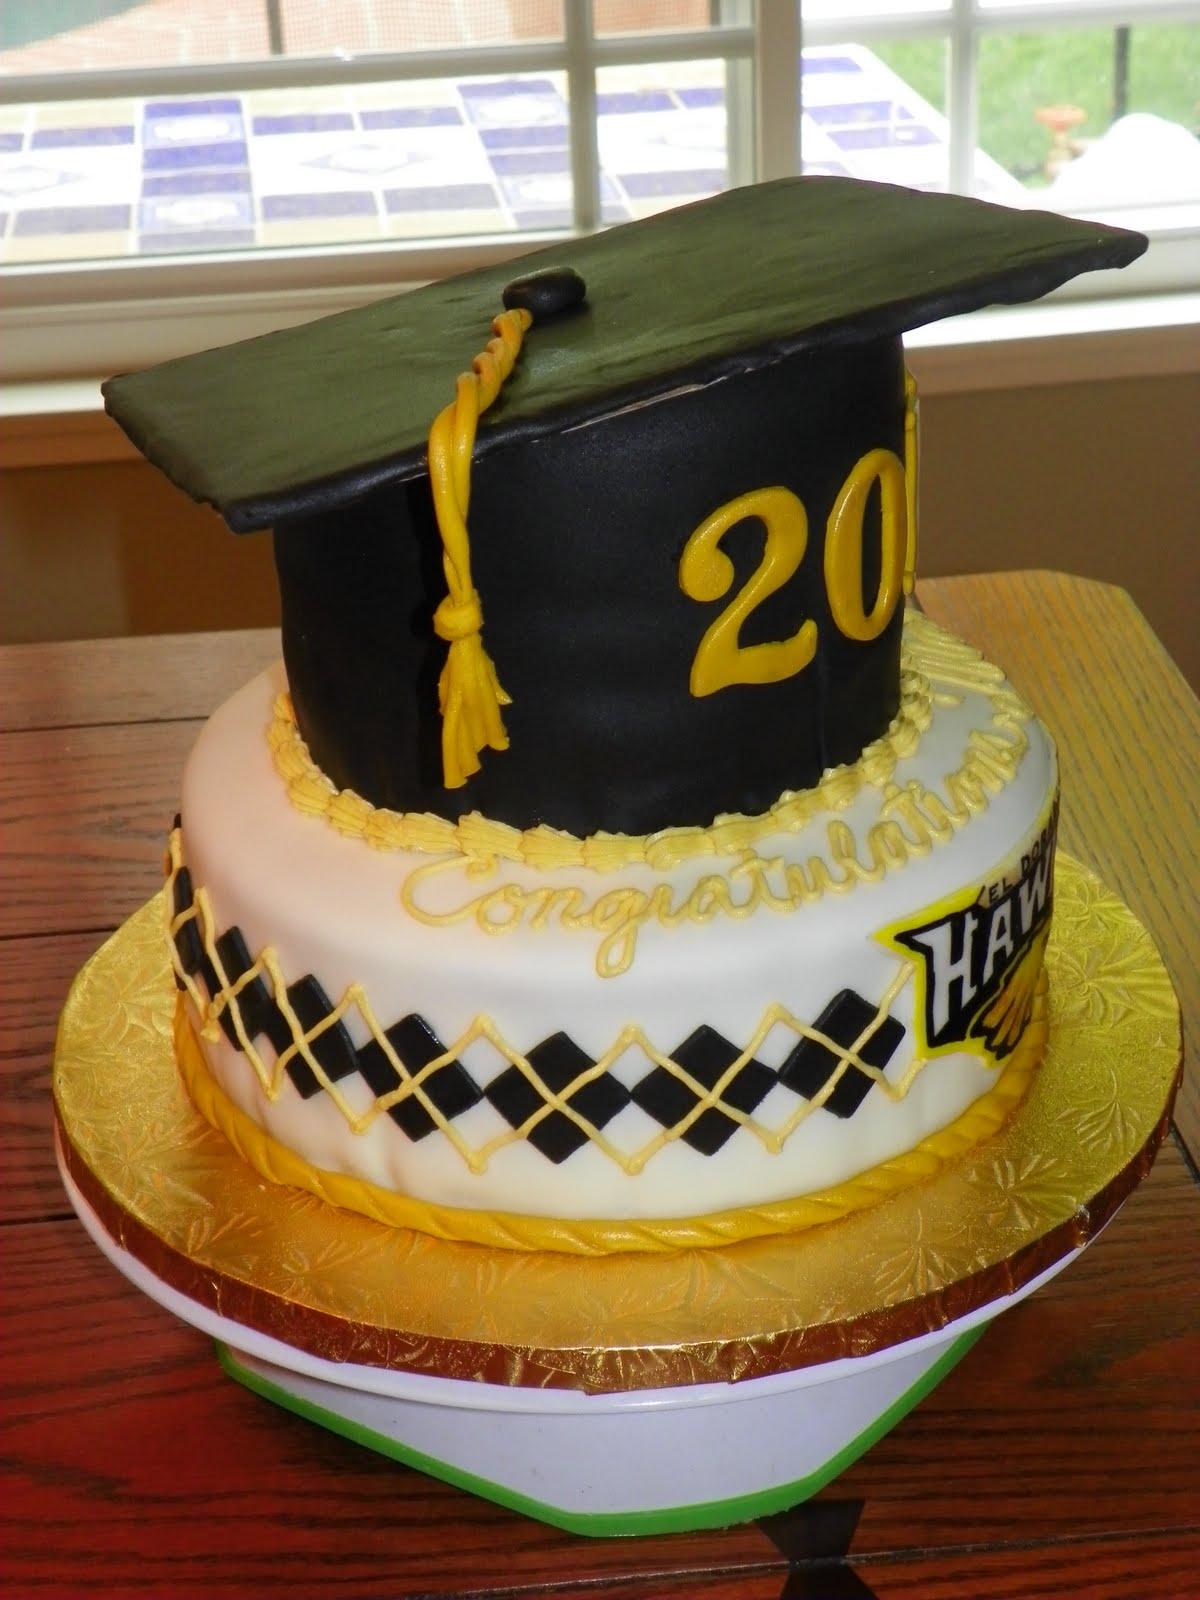 Plumeria Cake Studio: El Dorado High School Graduation Cake